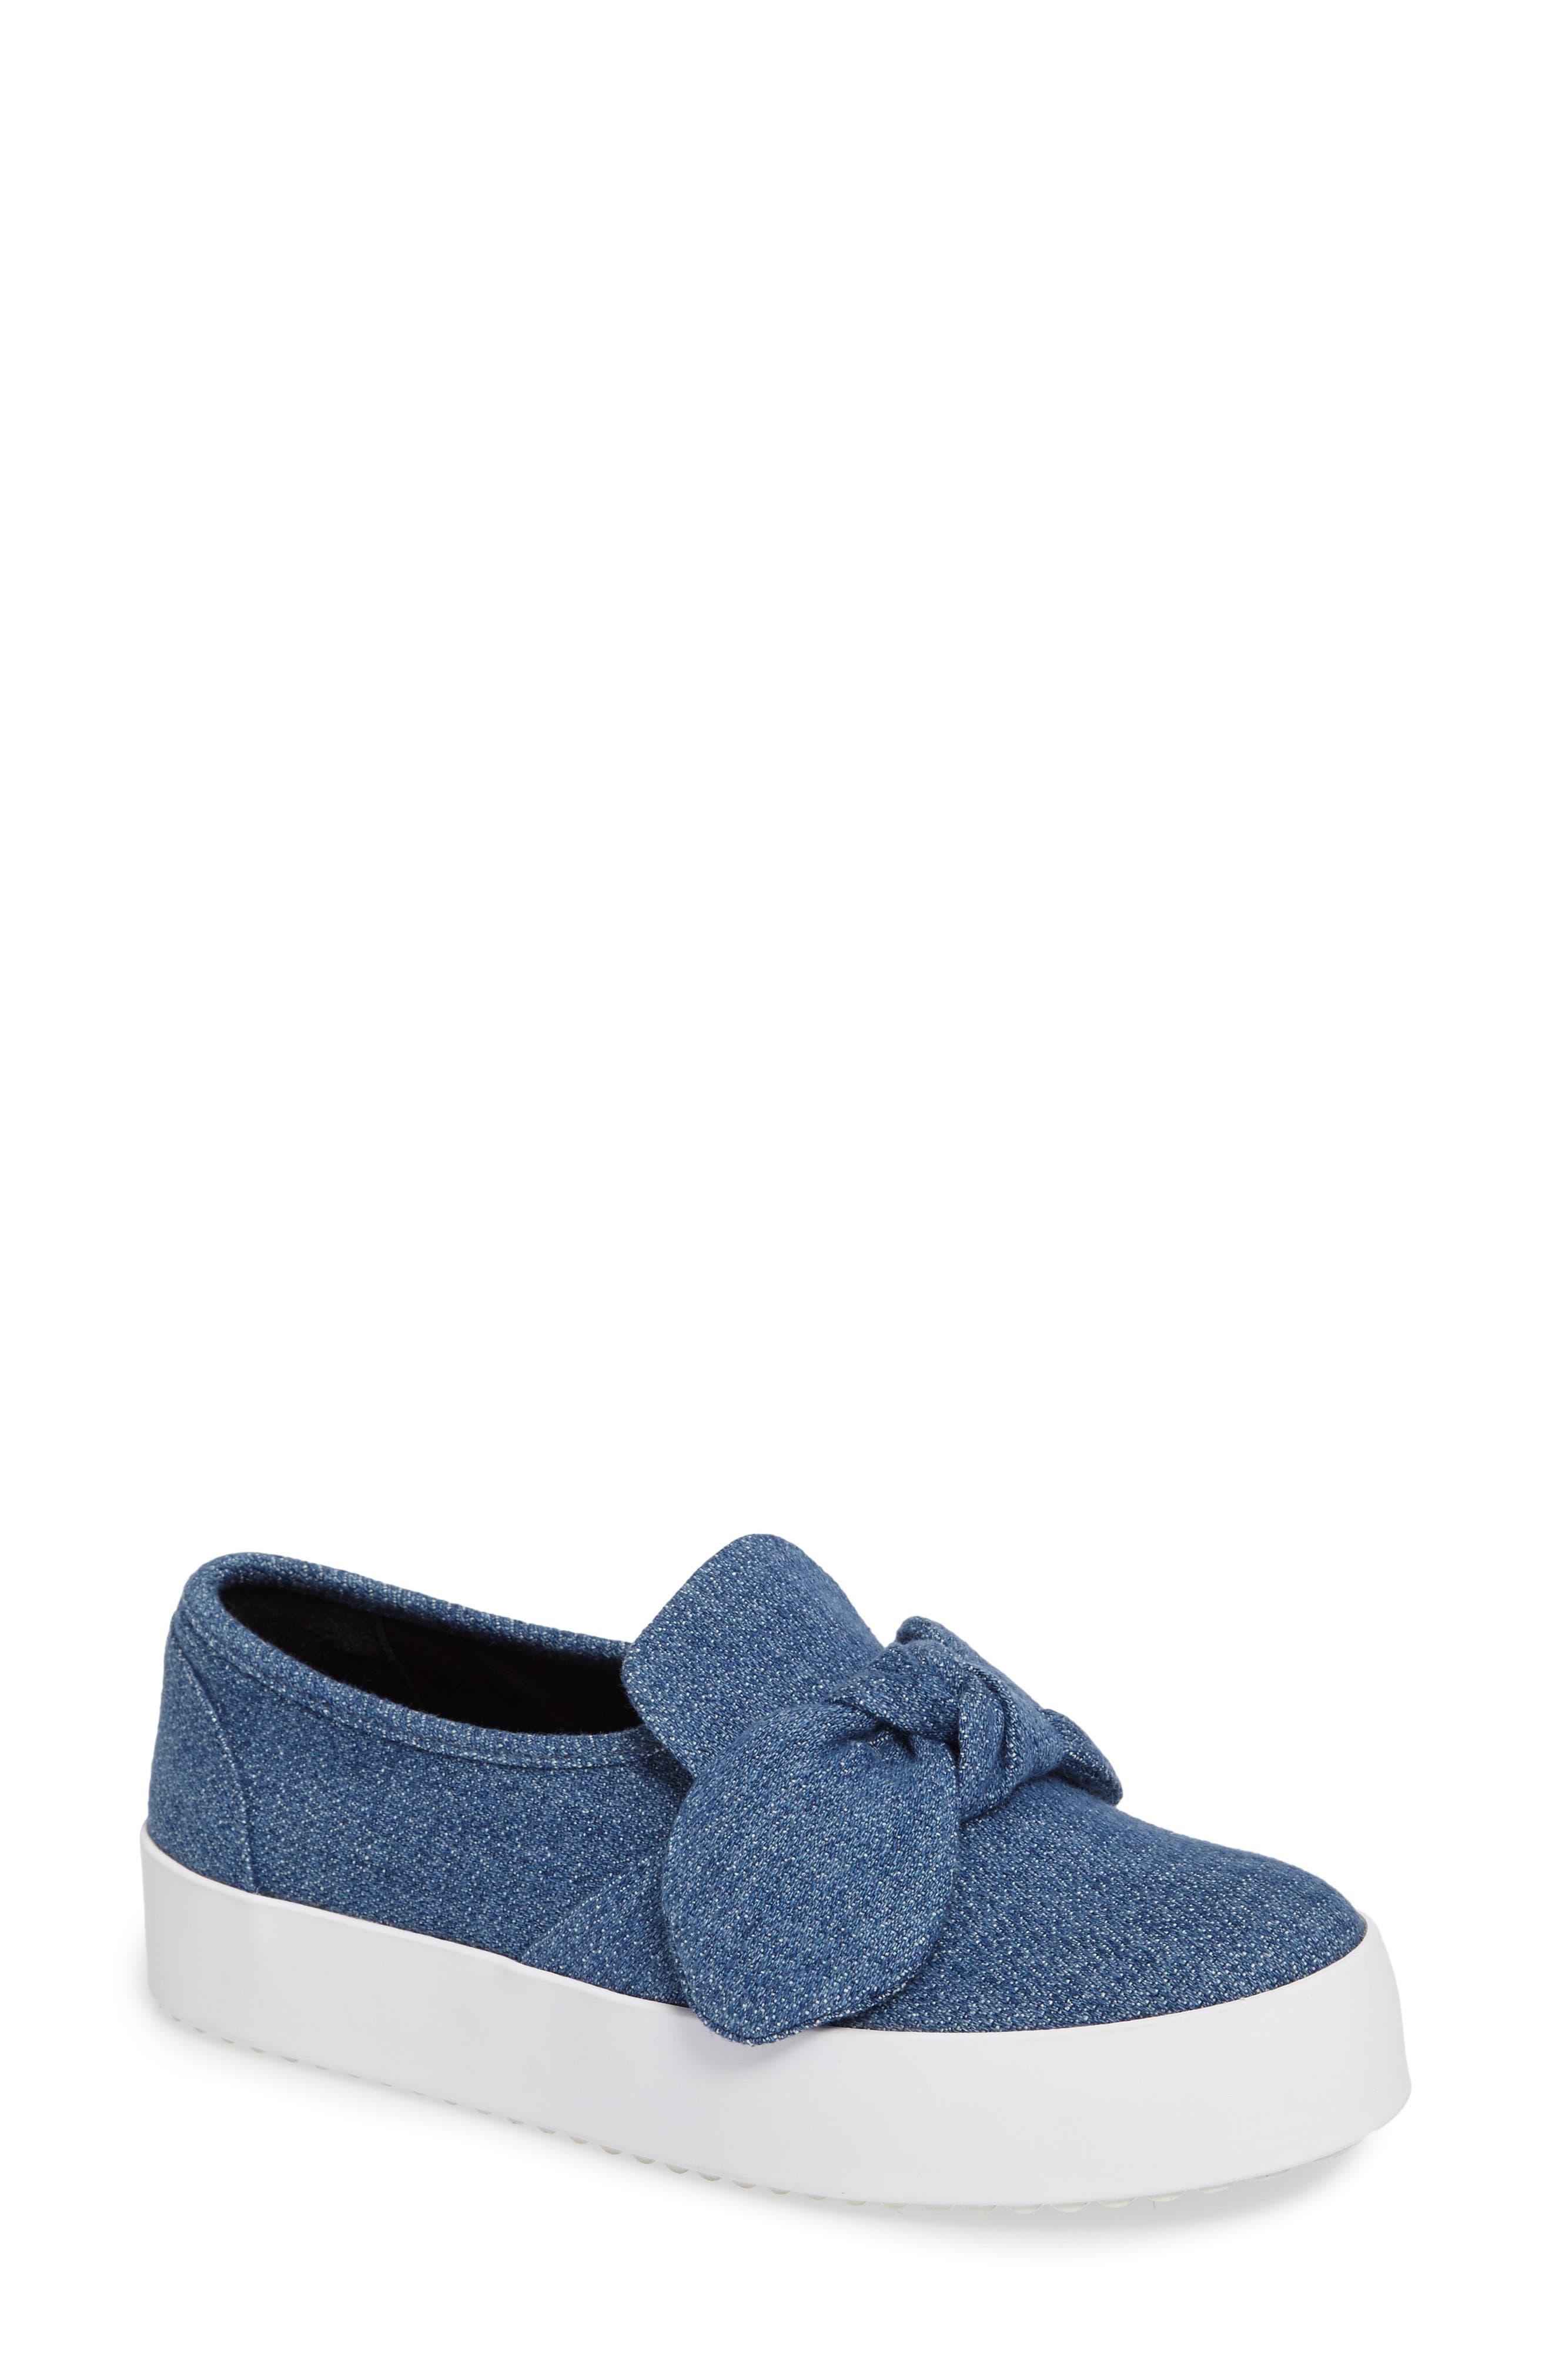 Stacey Bow Platform Sneaker,                             Main thumbnail 1, color,                             Light Blue Denim